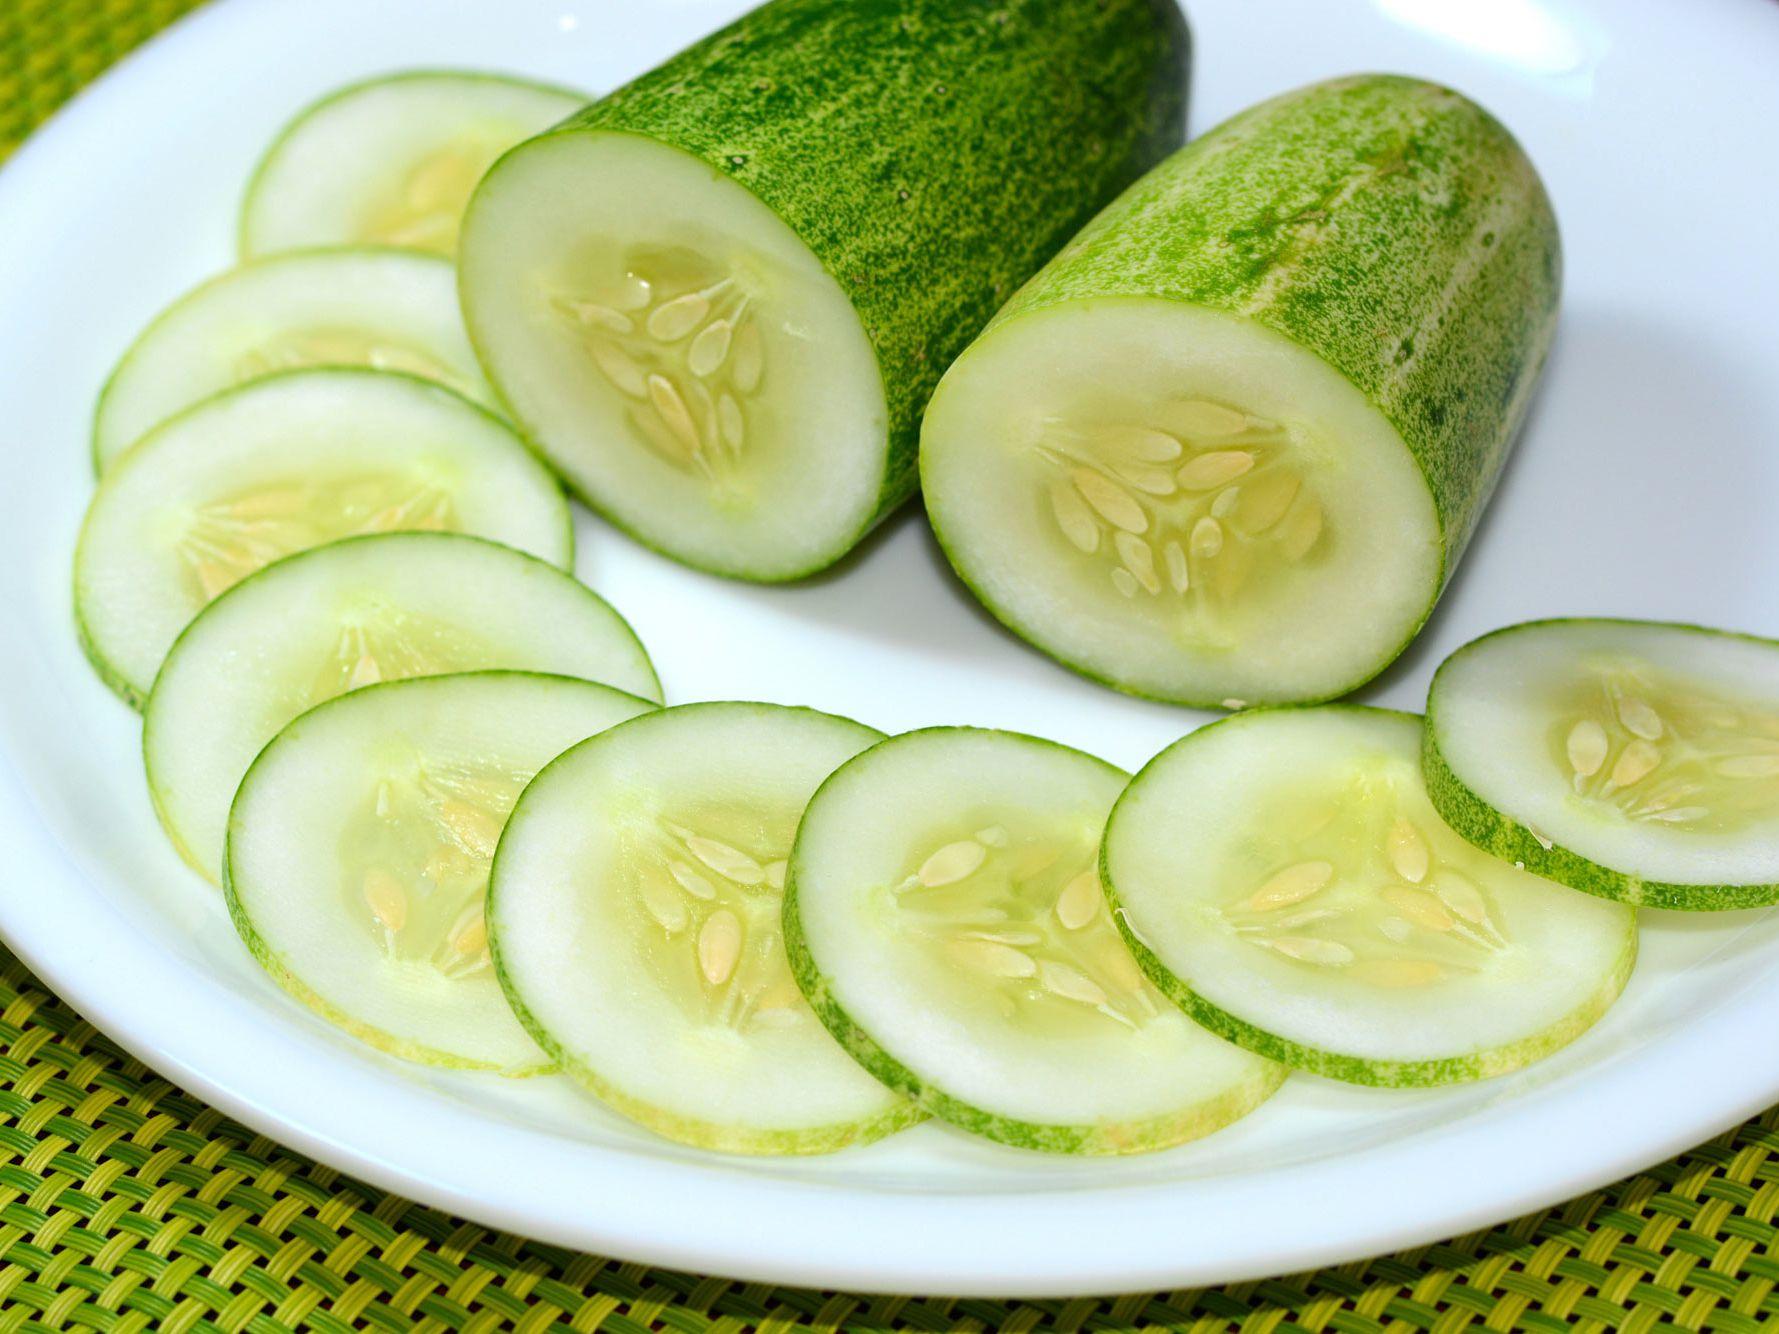 English Cucumbers Versus Regular Cucumbers